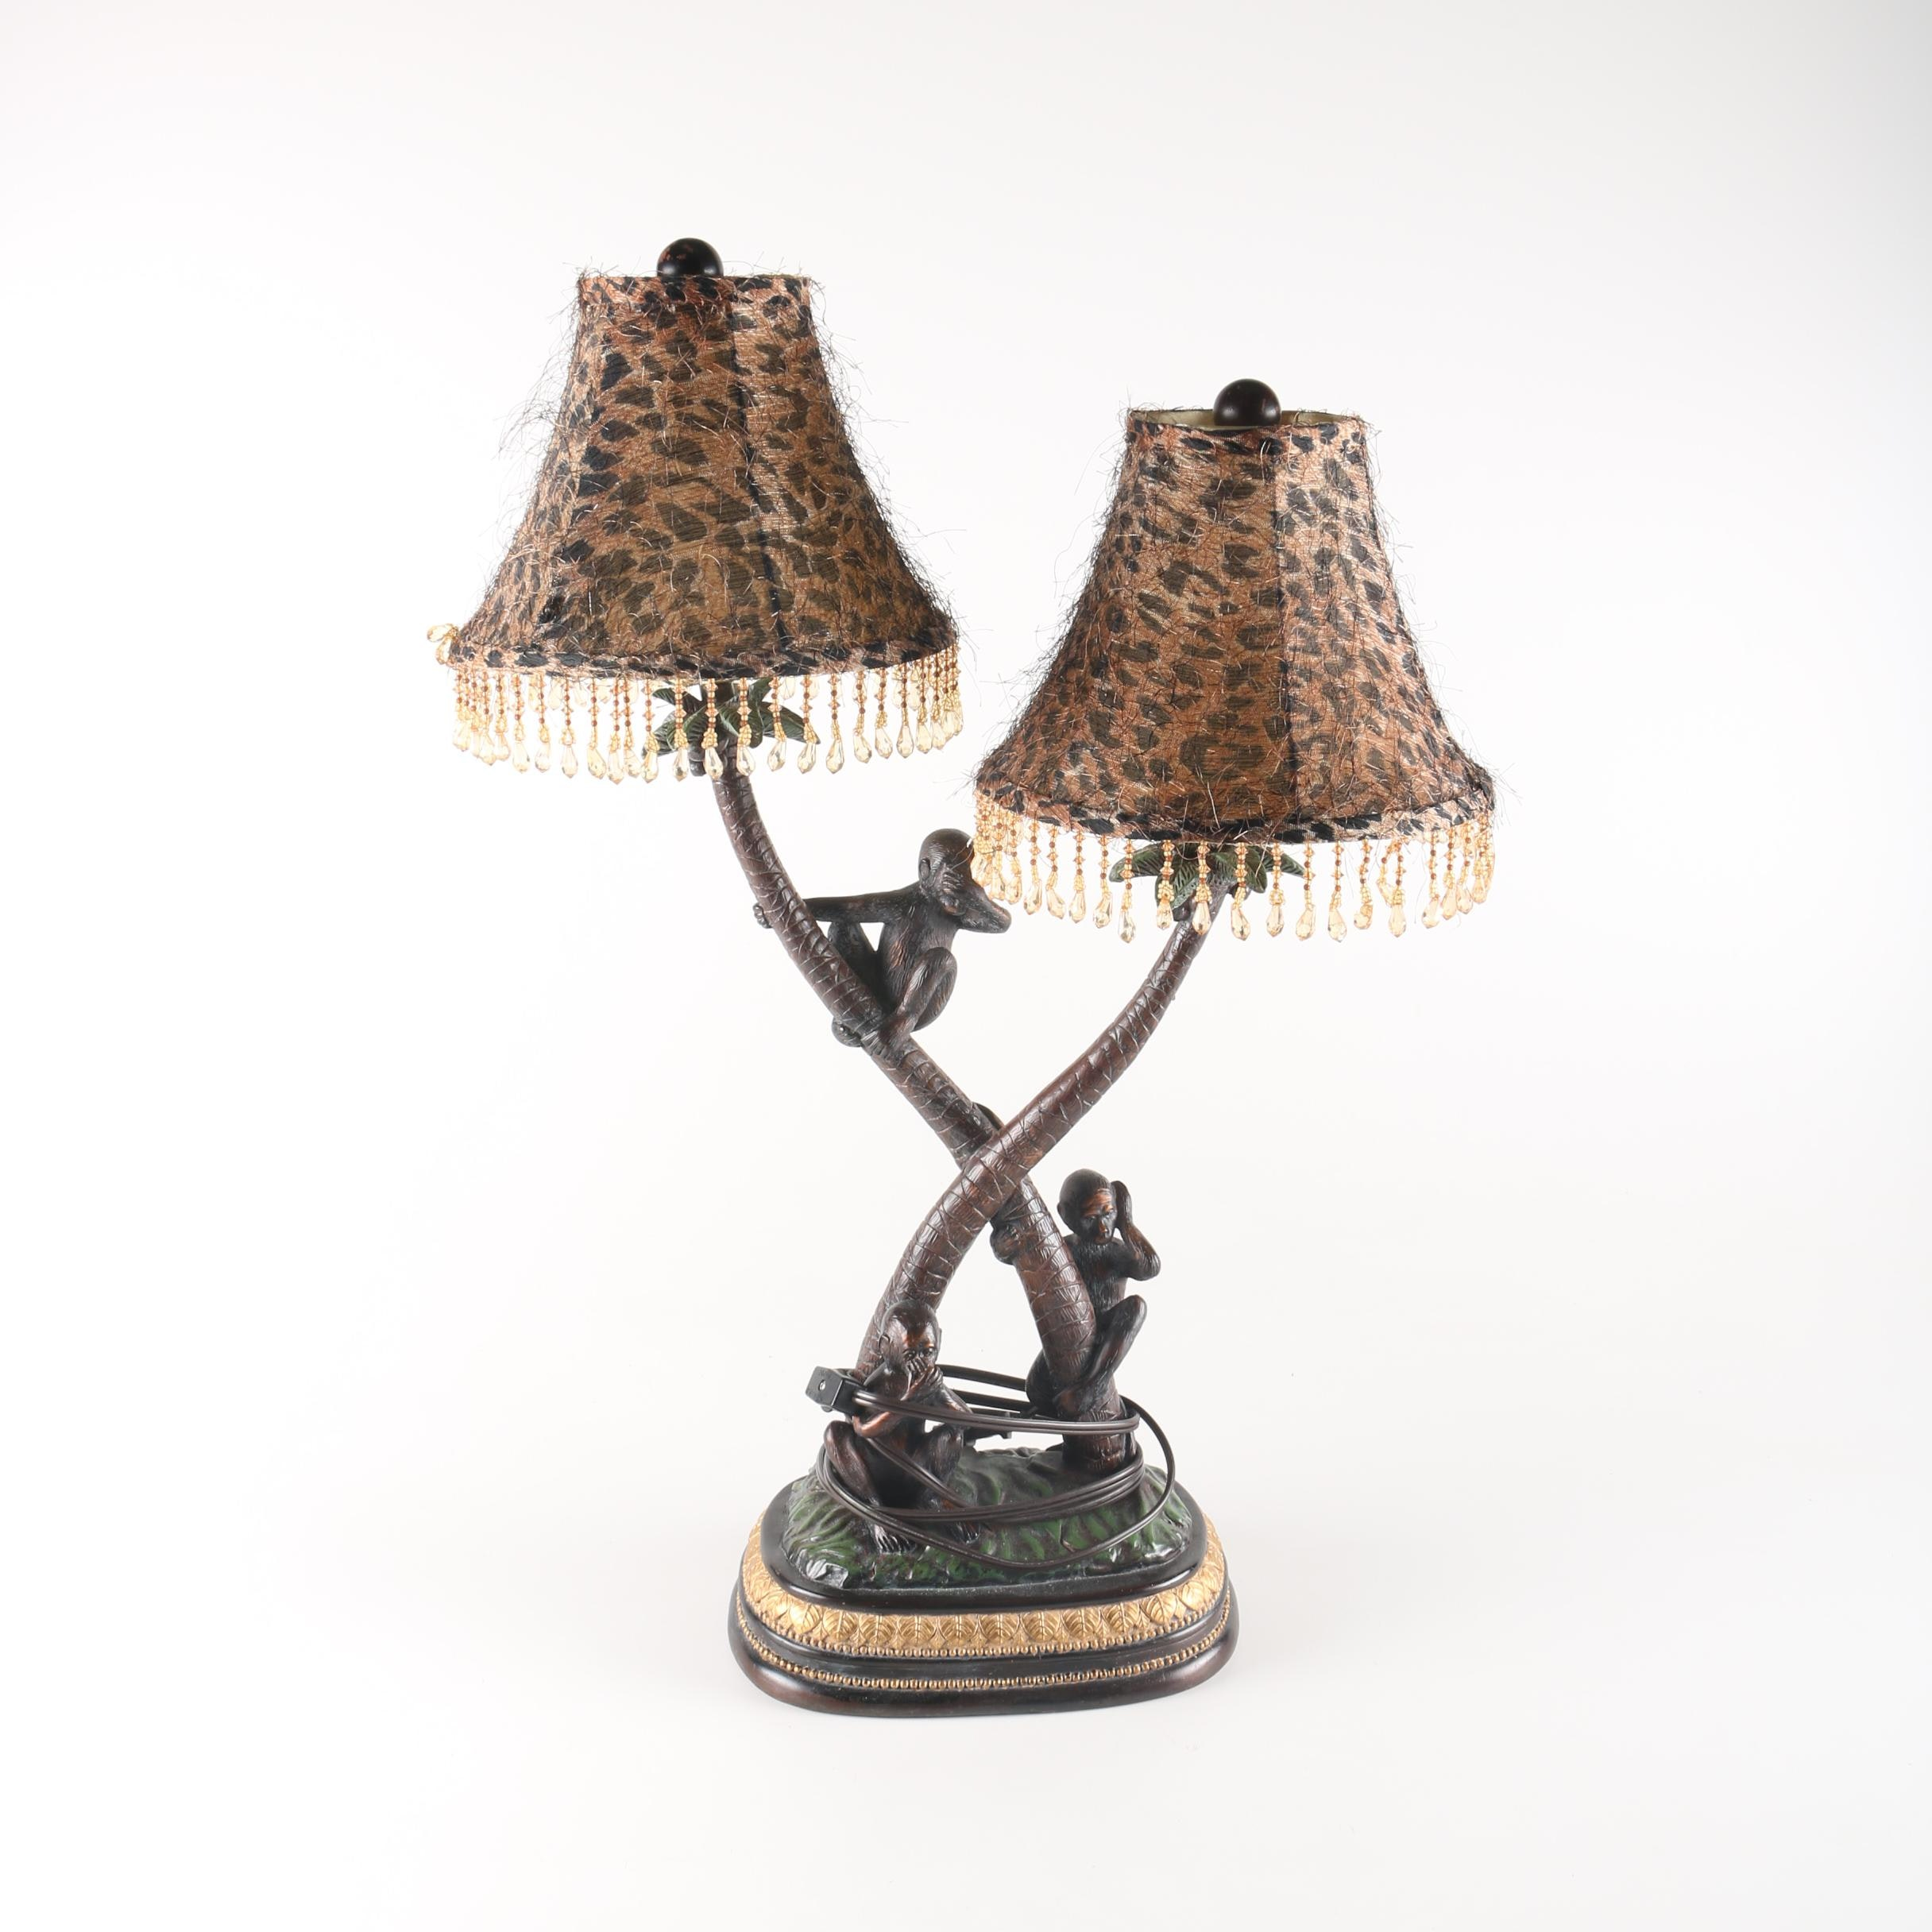 Three Wise Monkeys Lamp